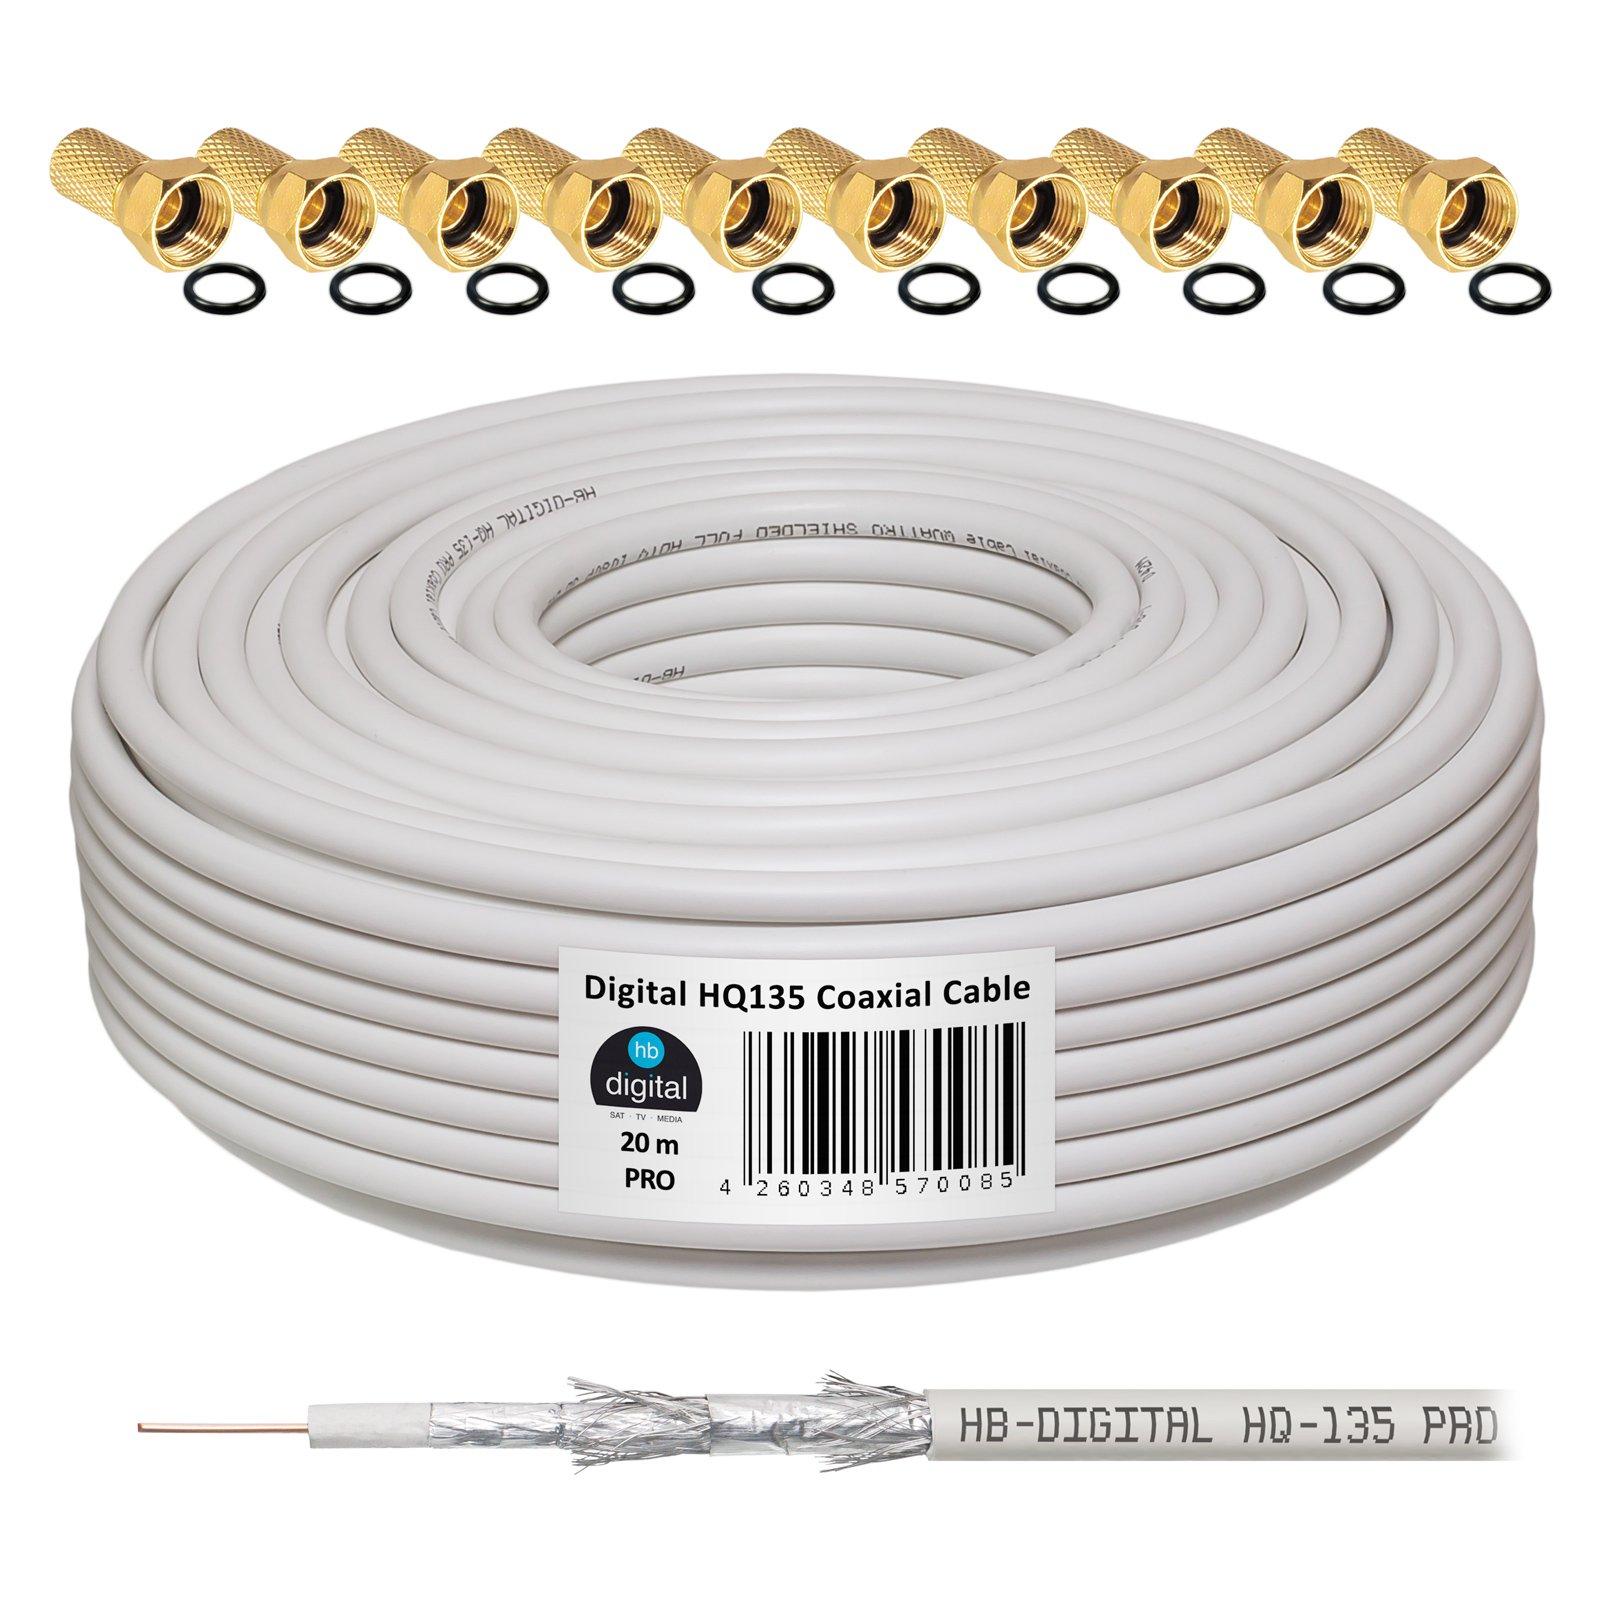 HB-Digital - Cable coaxial para DVB-S, S2 DVB-C y DVB-T(130 dB, HQ ...